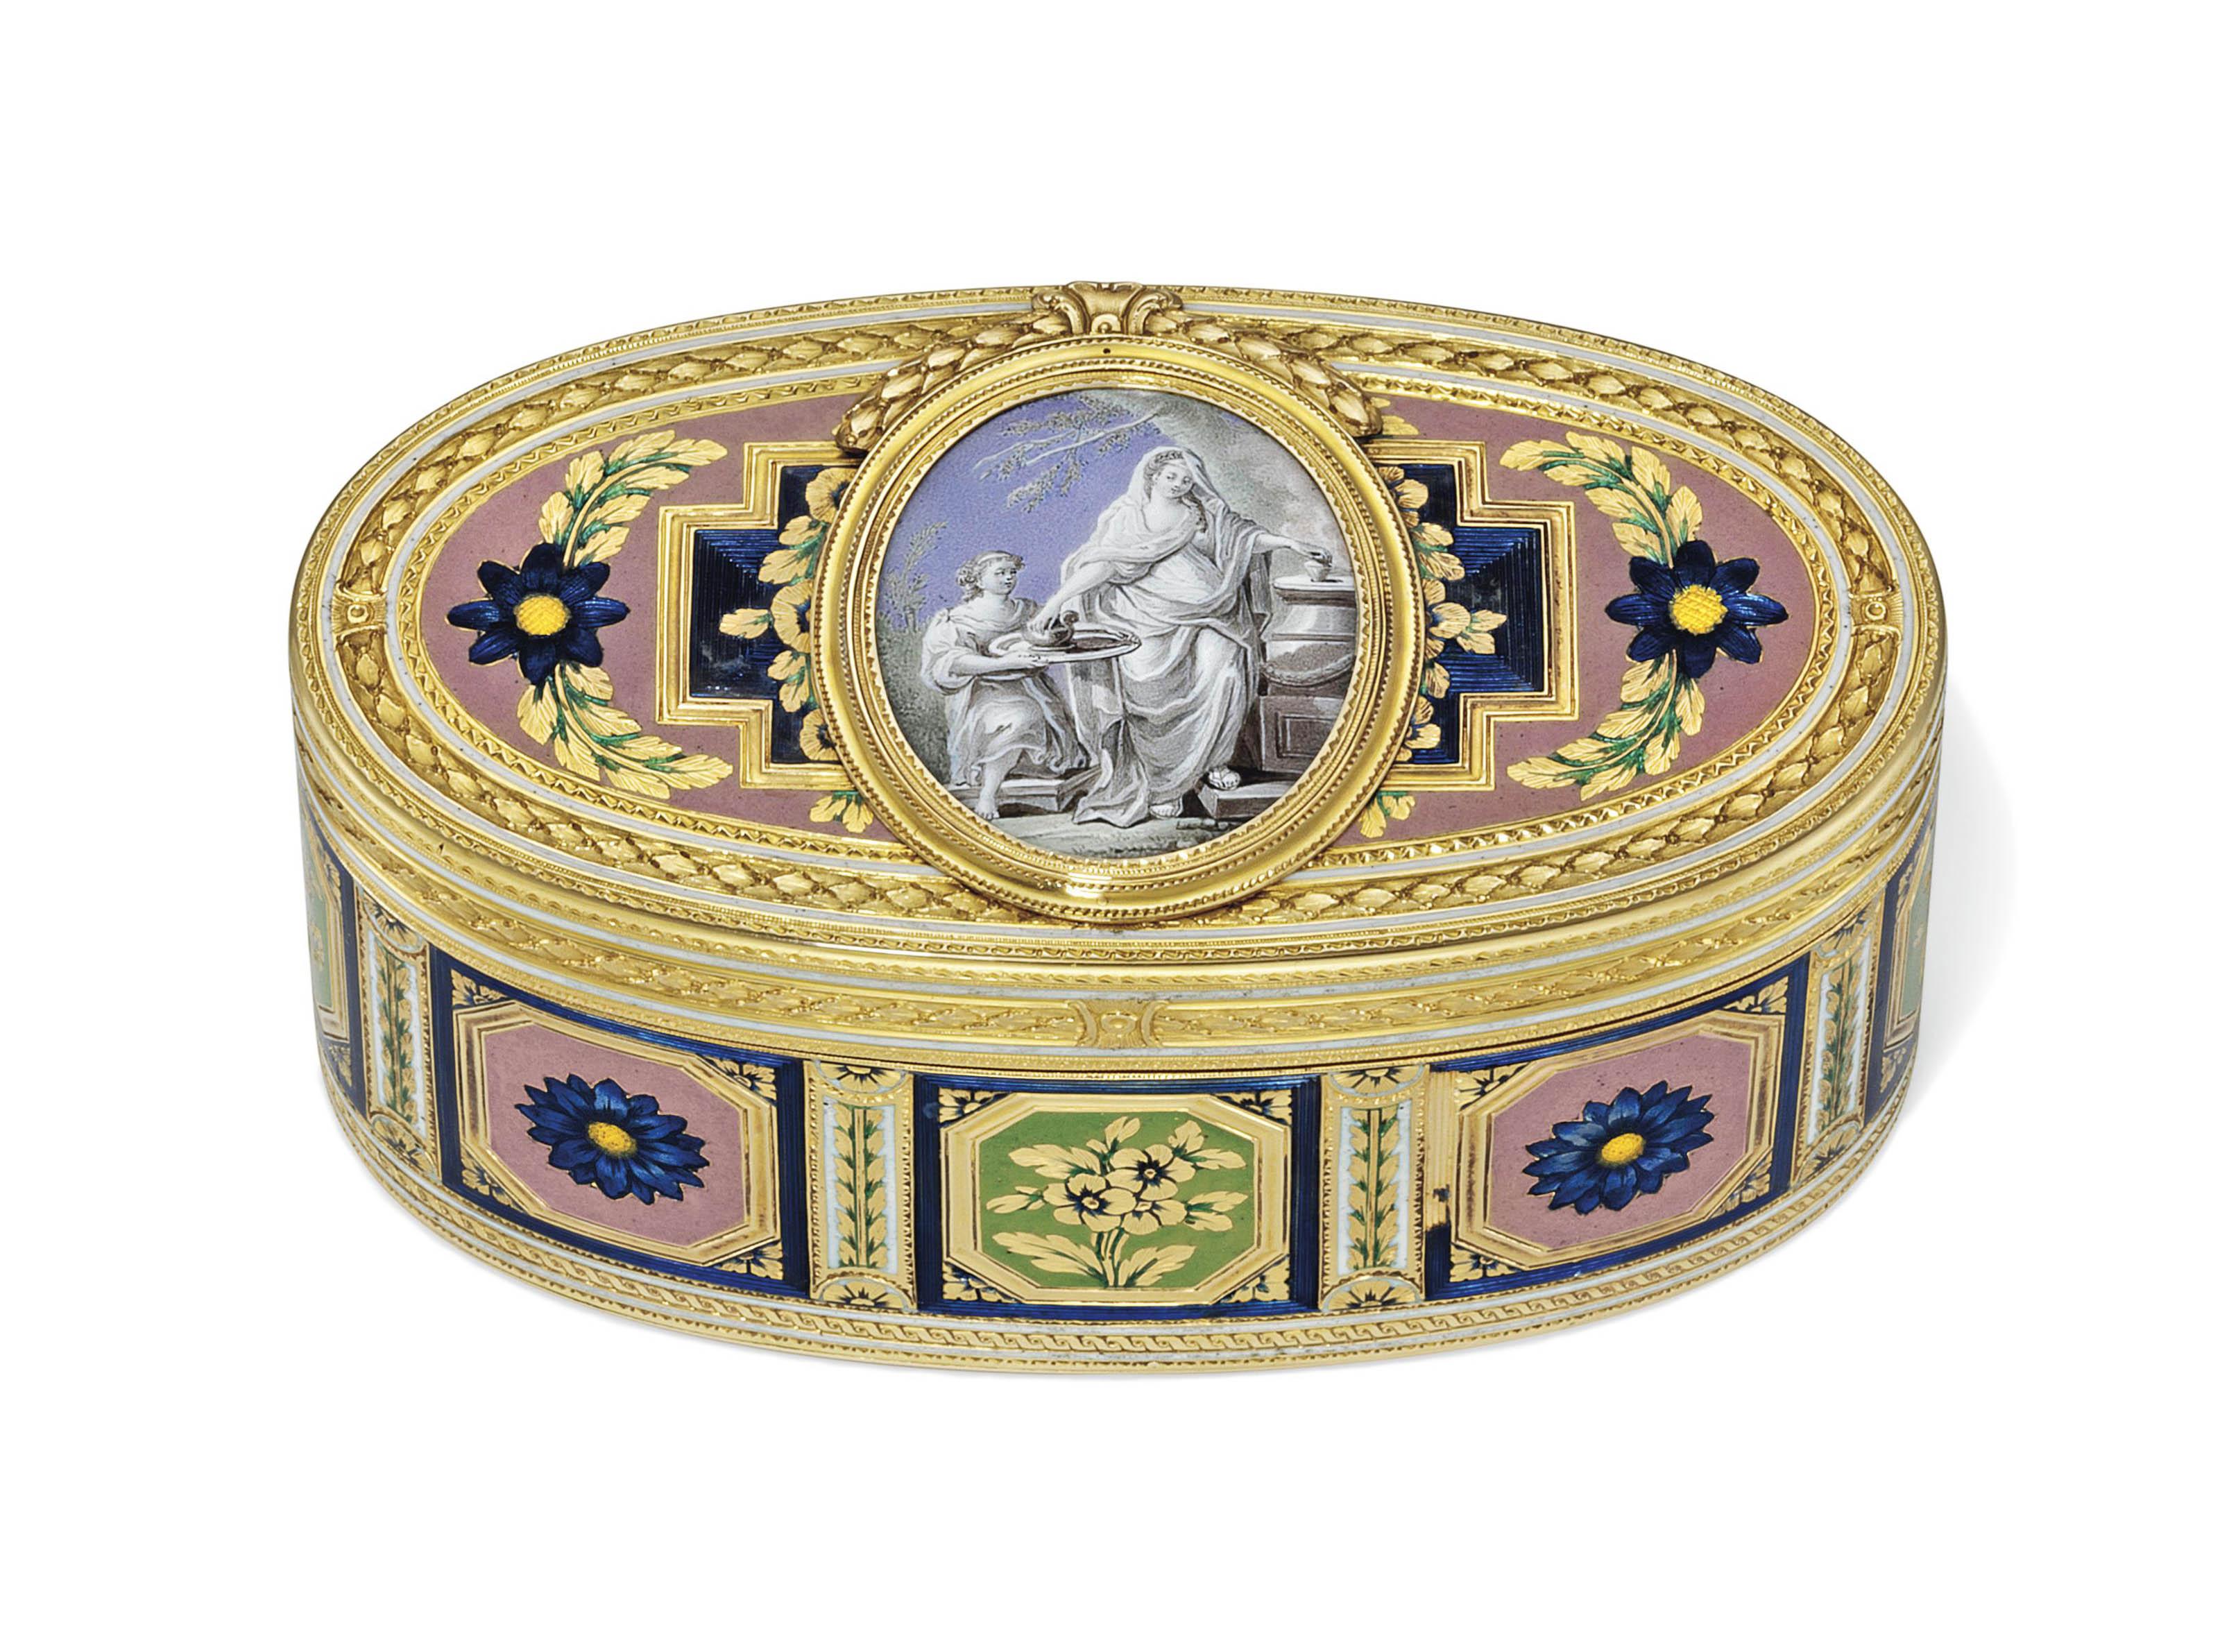 A LOUIS XV ENAMELLED GOLD SNUF